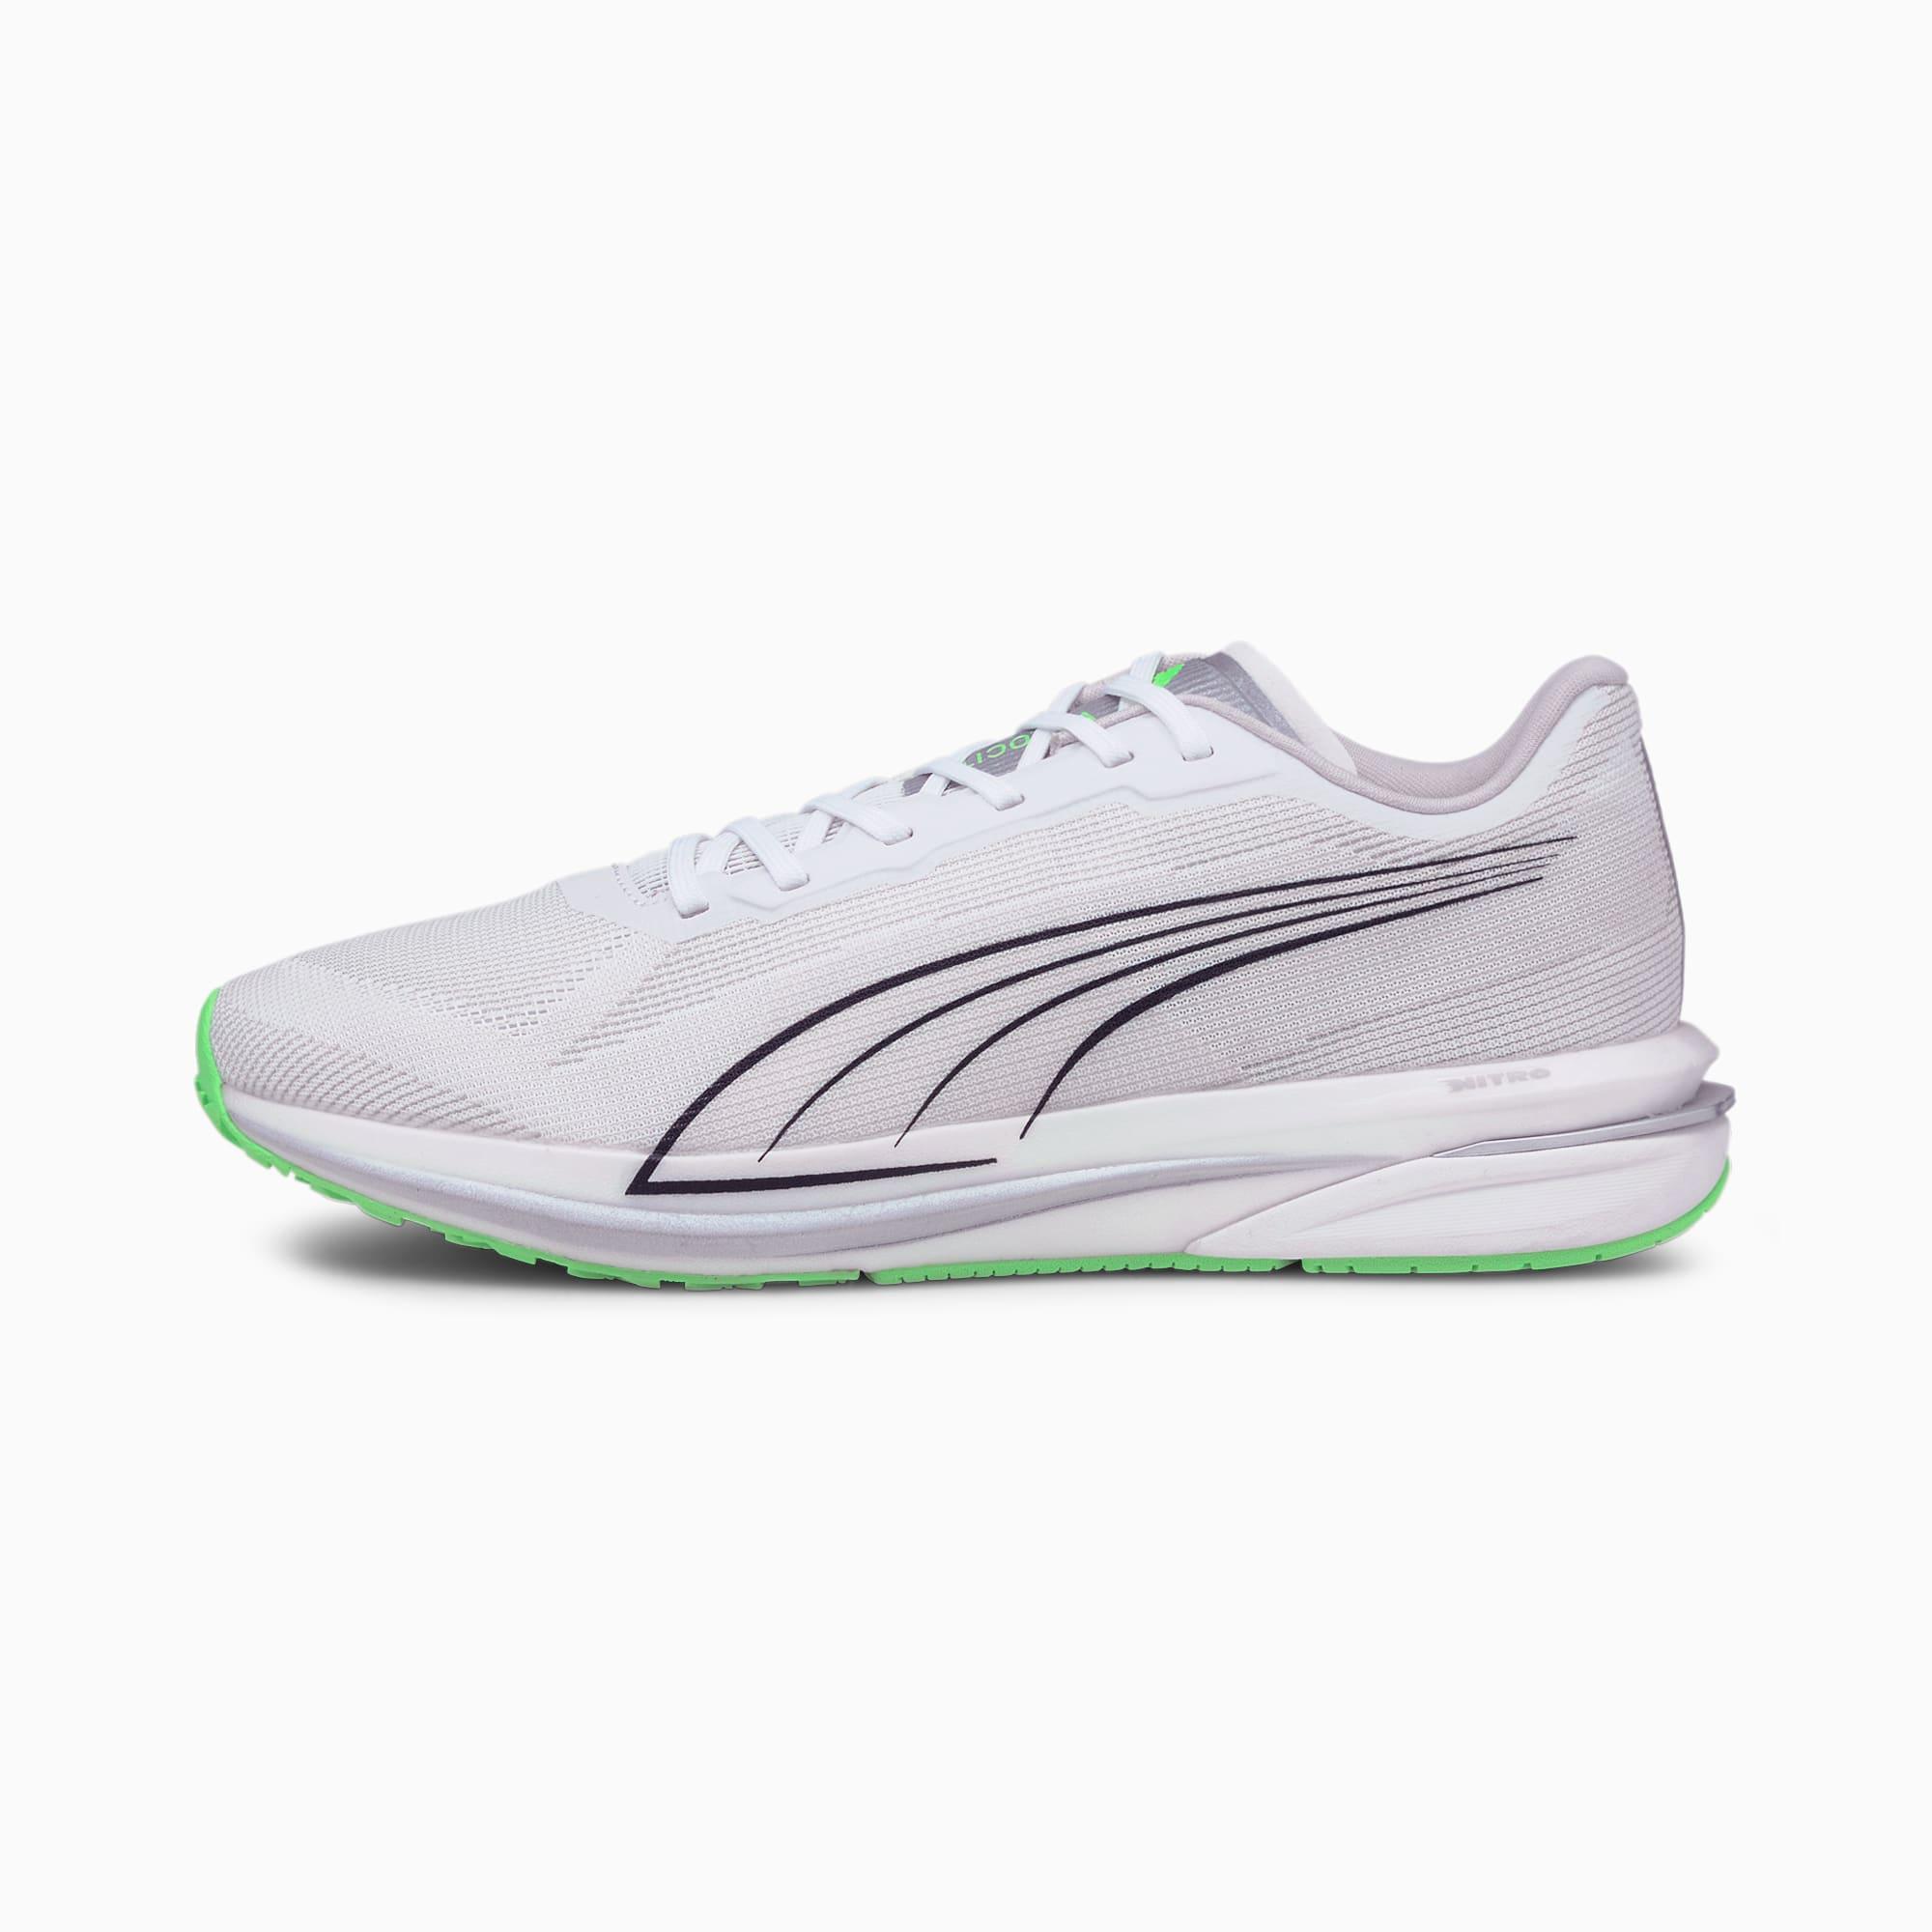 Velocity NITRO COOLadapt Men's Running Shoes